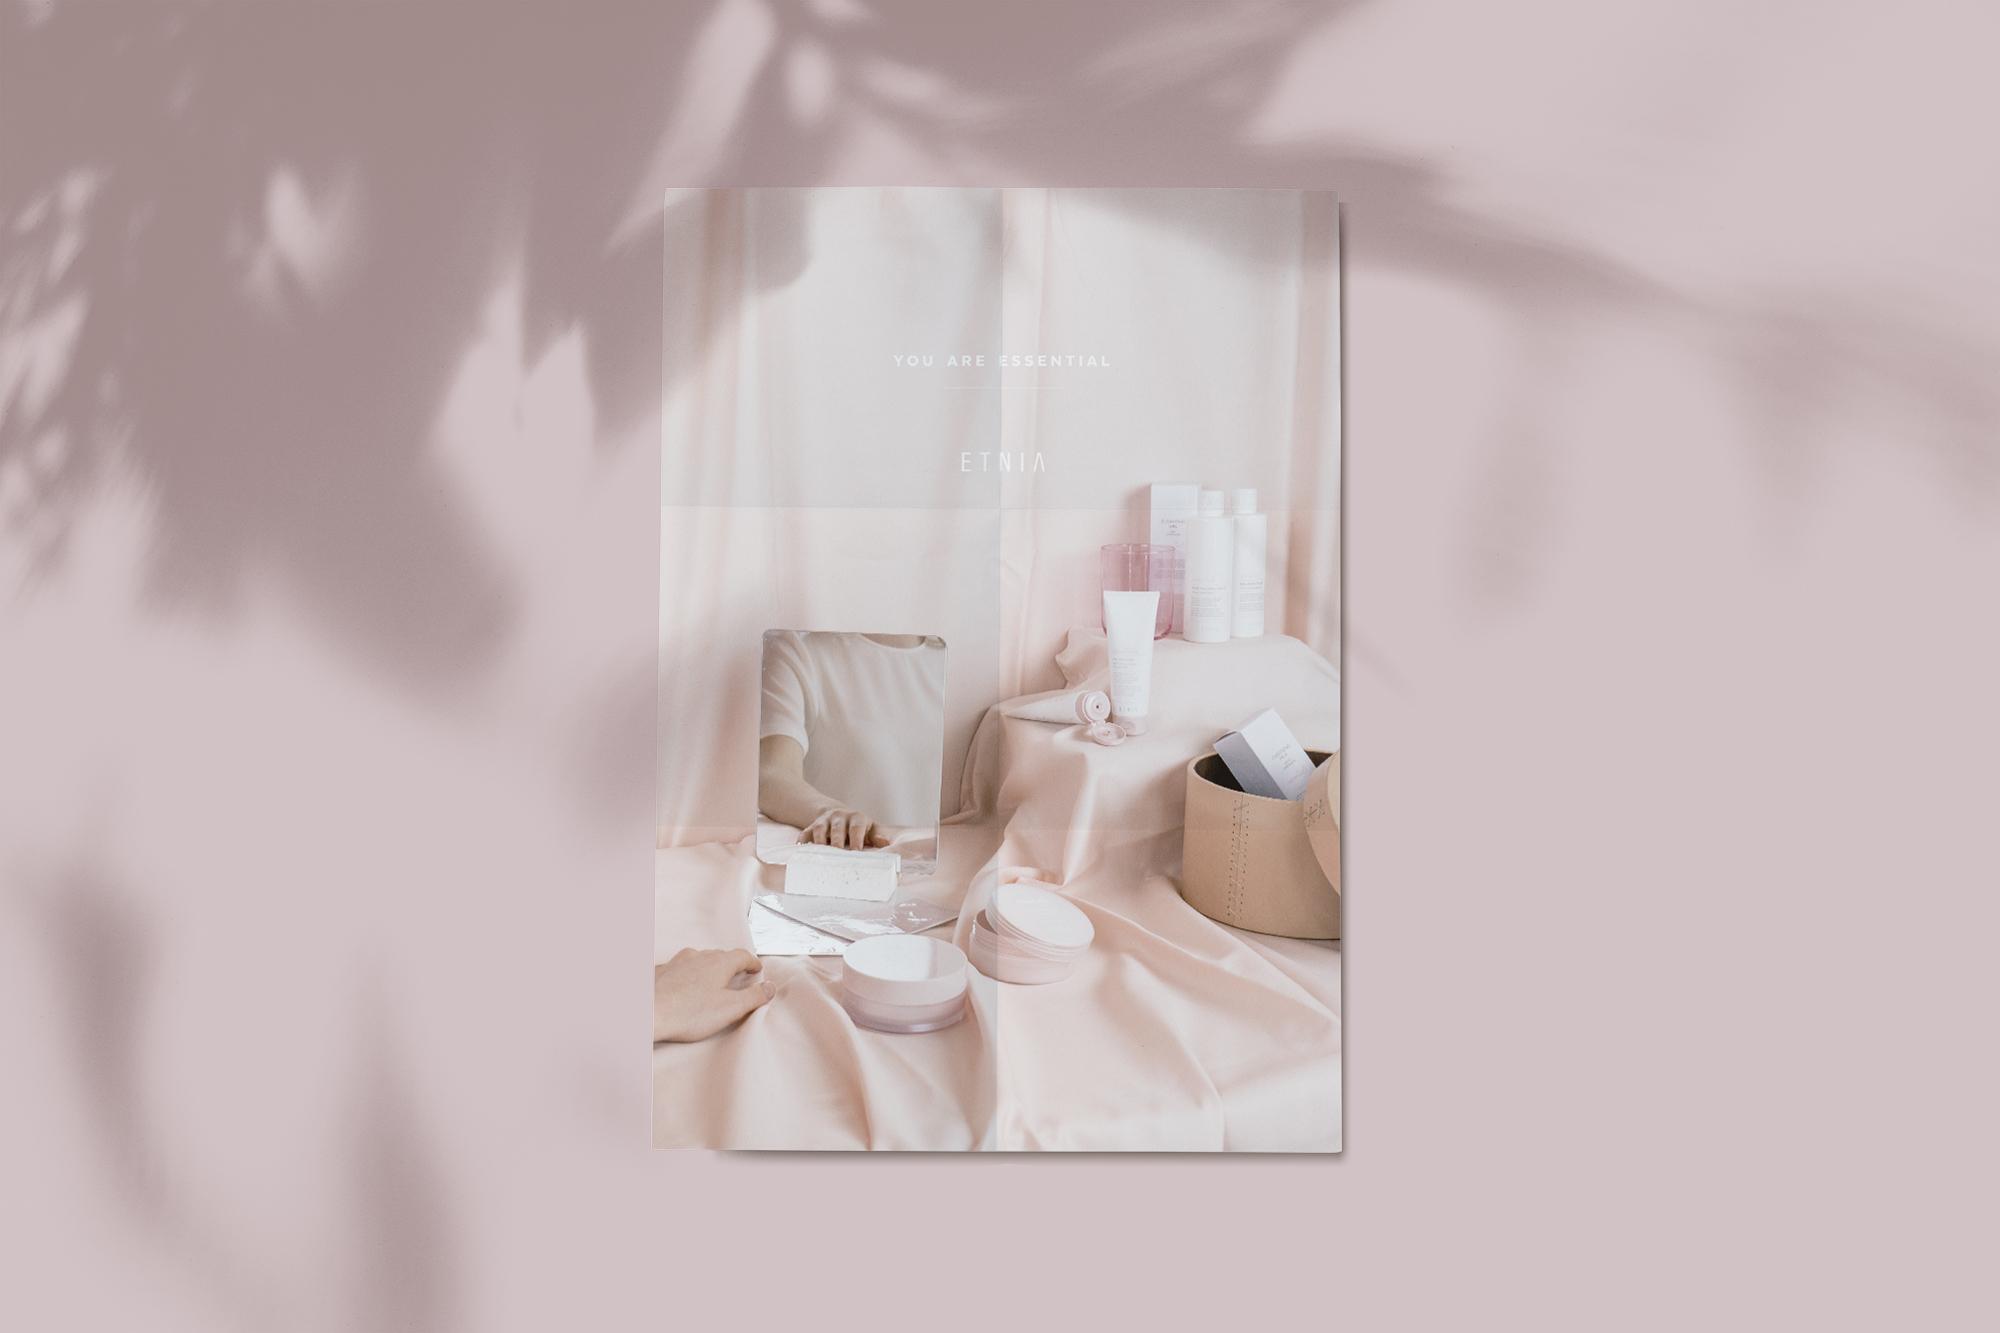 Essentials - Etnia Cosmetics by KRAFTED - Jennifer G. & Alejandro B. - Creative Work